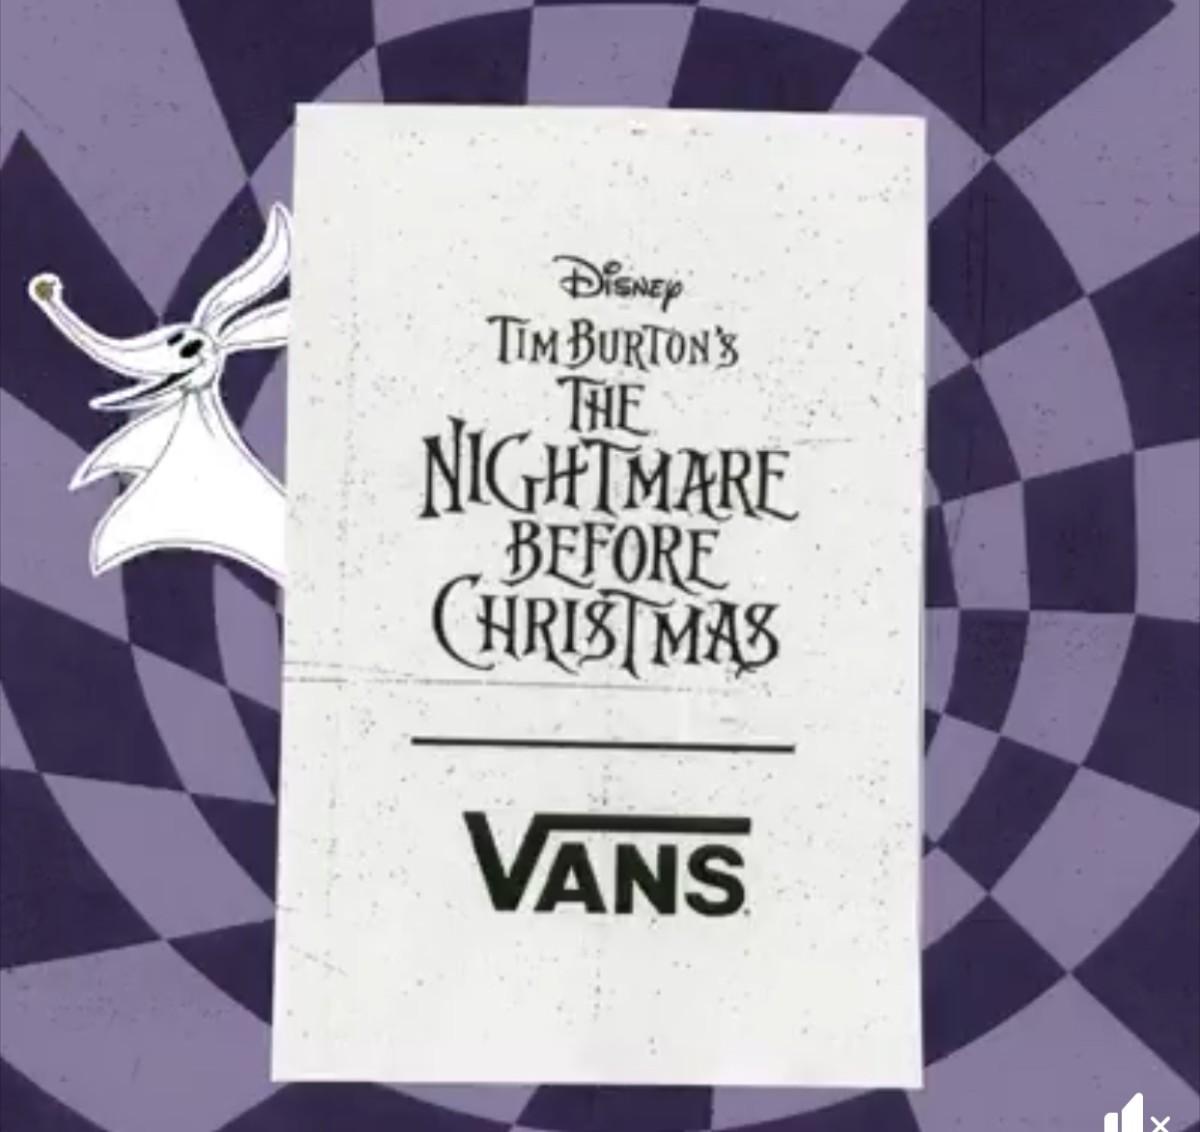 New Nightmare Before Christmas Line Coming Soon from Vans! 1